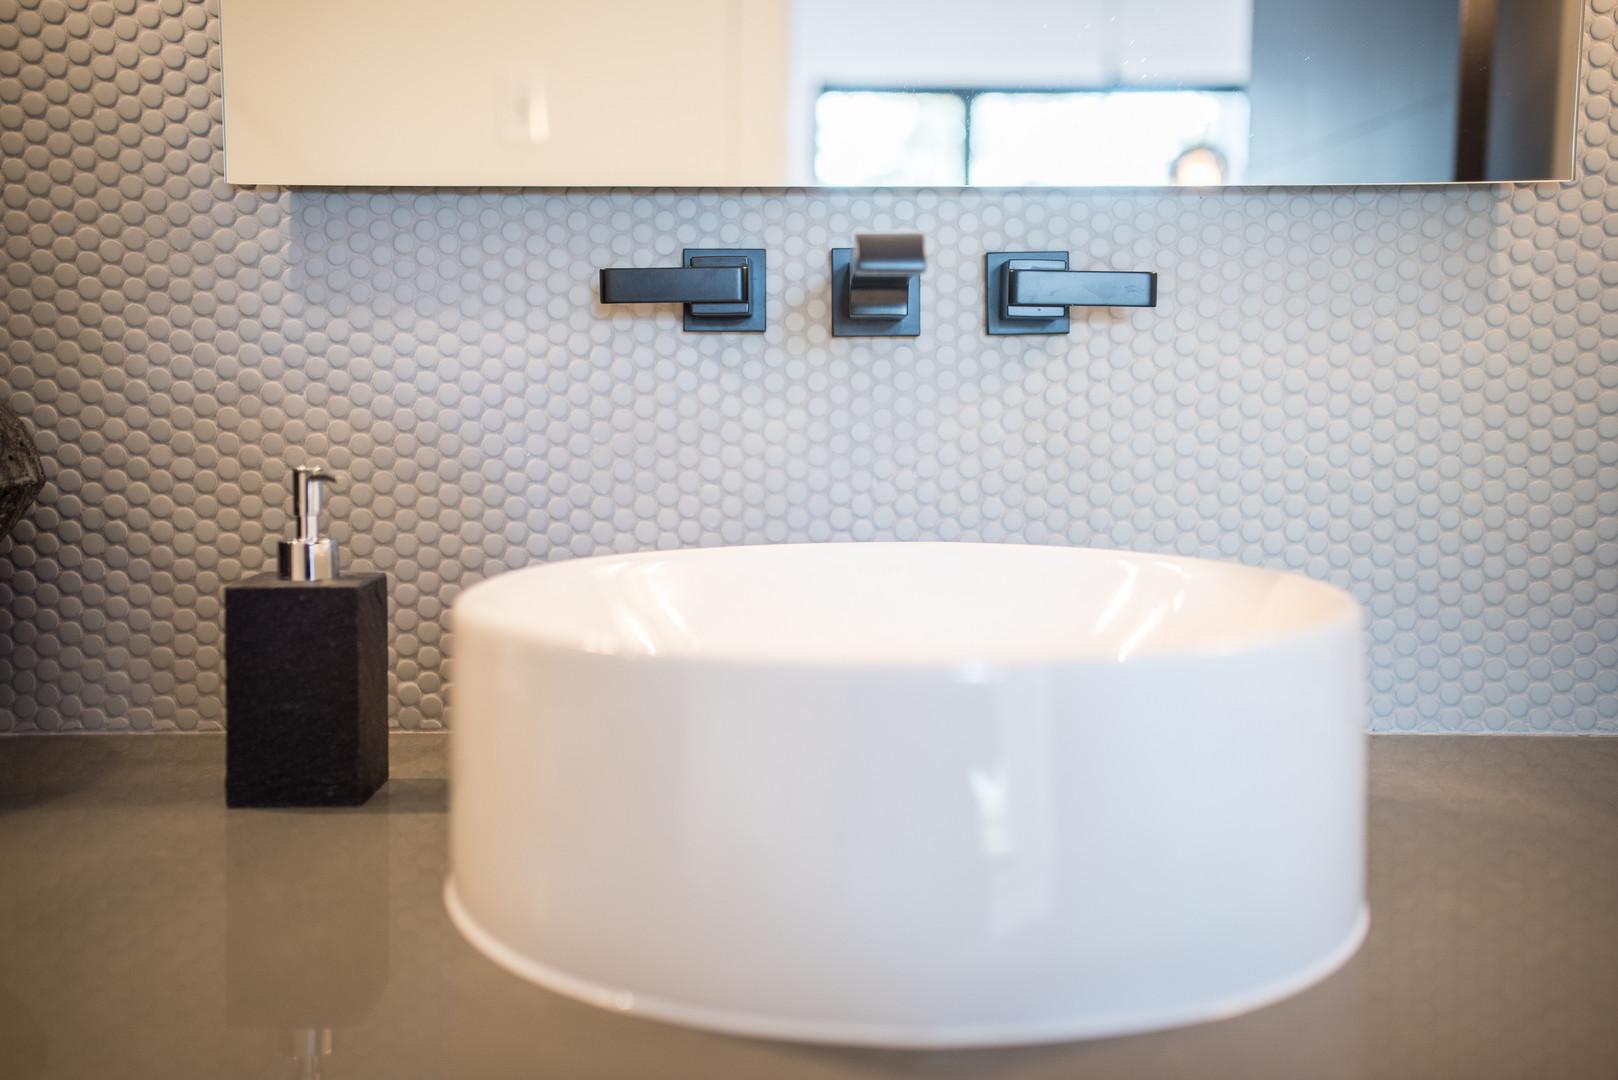 Bathroom Sink & Black Taps